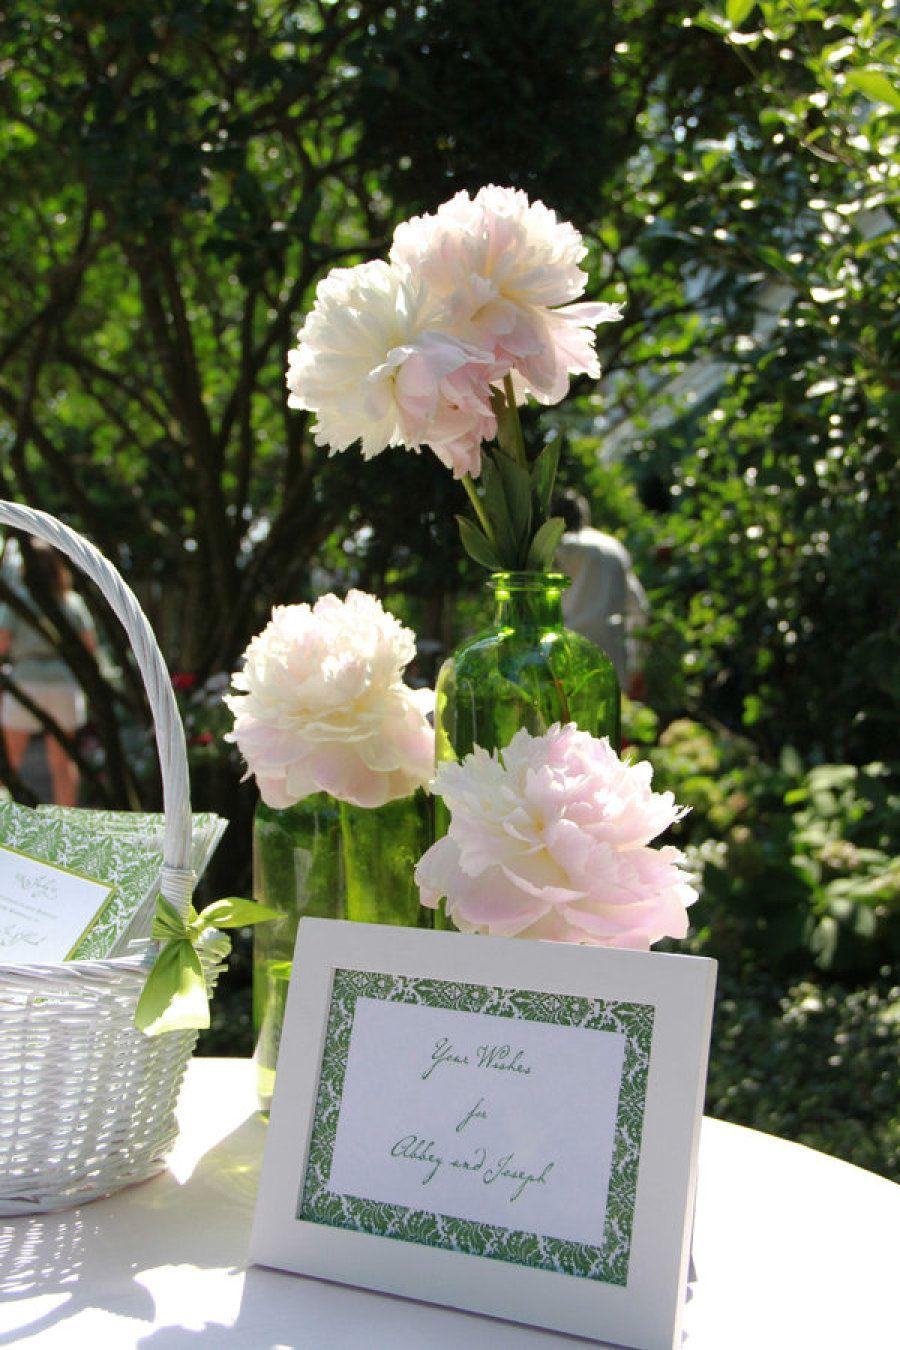 Floral & Event Design: Engaging Events, LLC - http://www.stylemepretty.com/portfolio/engagagingevents Photography: Liz Duren Photography - lizduren.com/   Read More on SMP: http://www.stylemepretty.com/2011/12/22/charleston-wedding-from-engaging-events-liz-duren-photography/